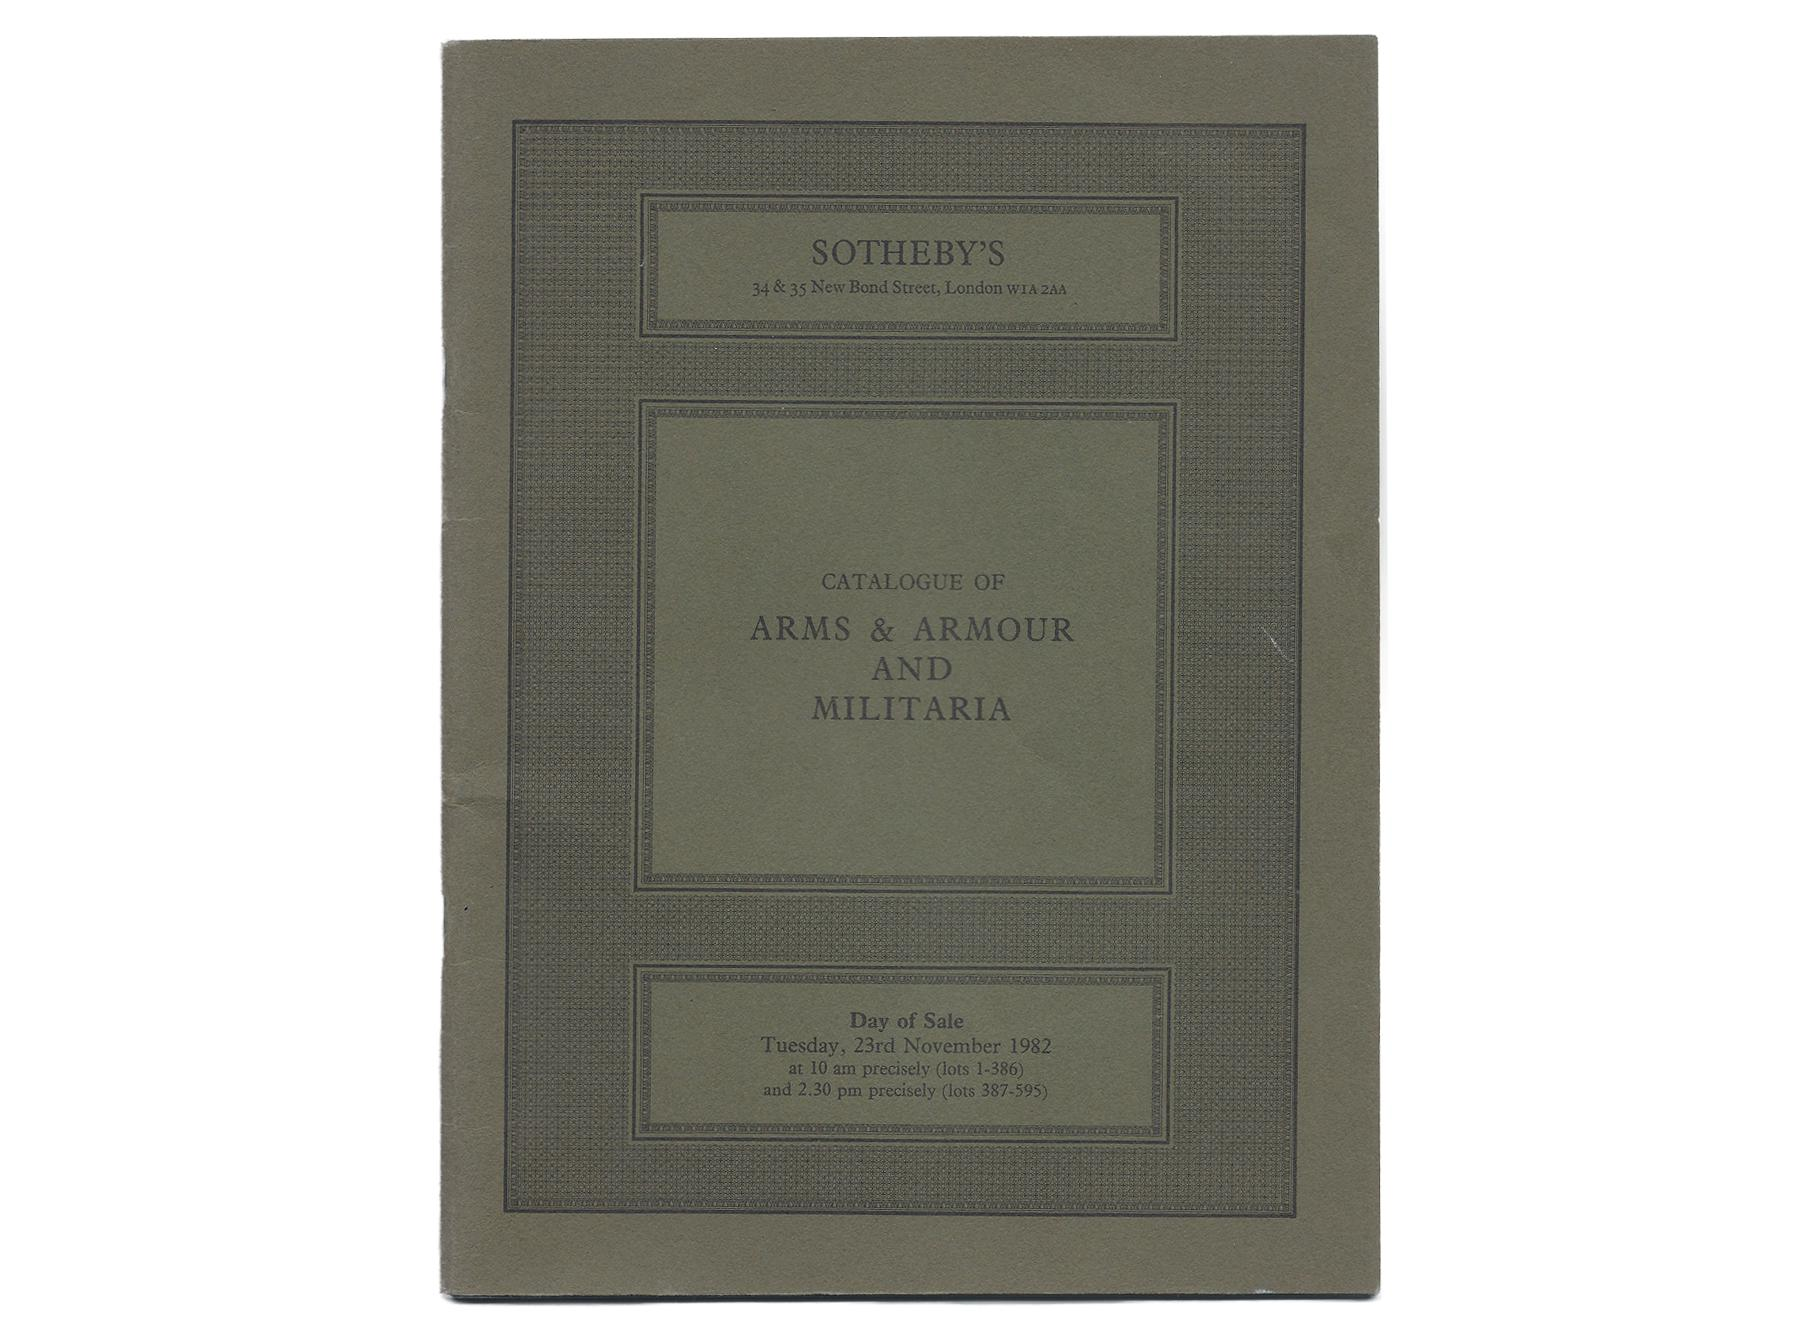 Sothebys & Co